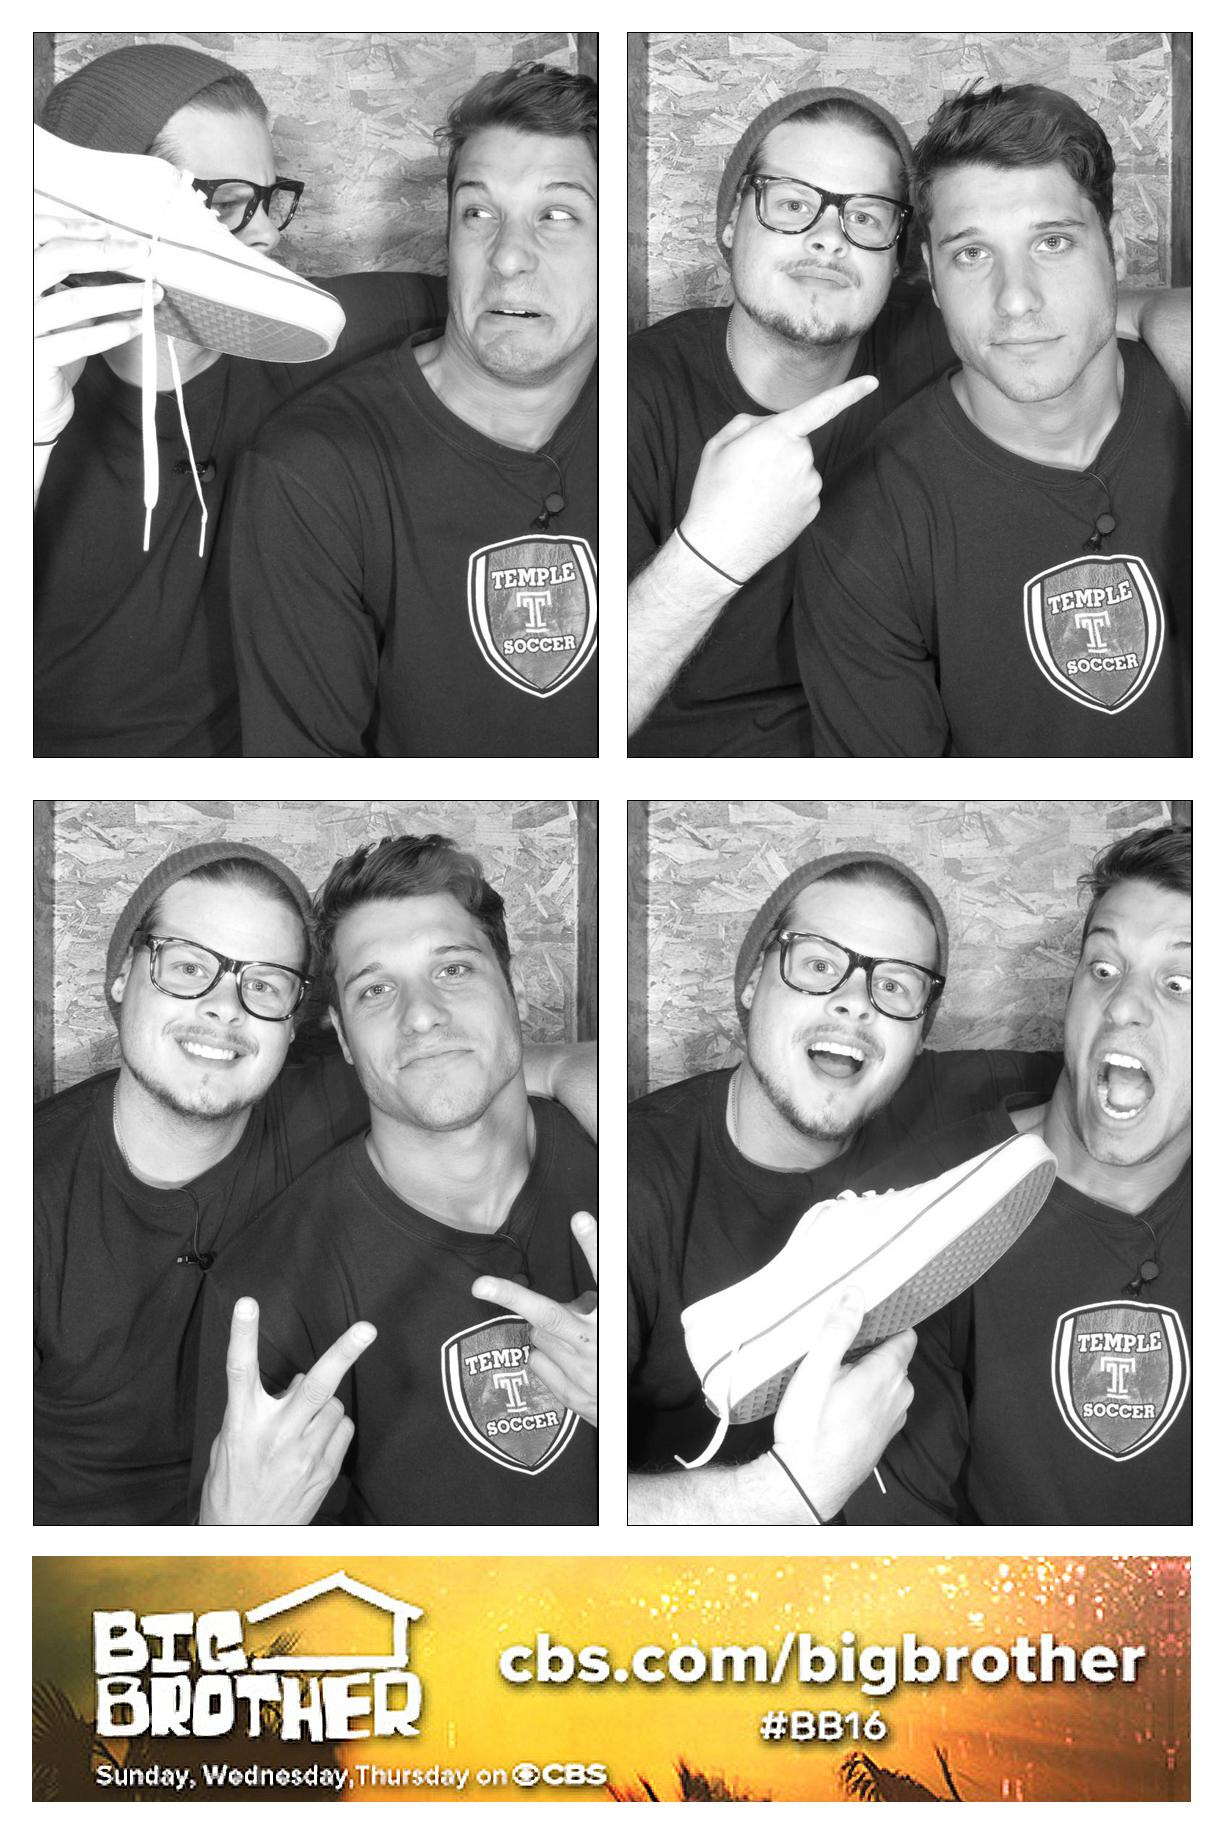 Derrick and Cody